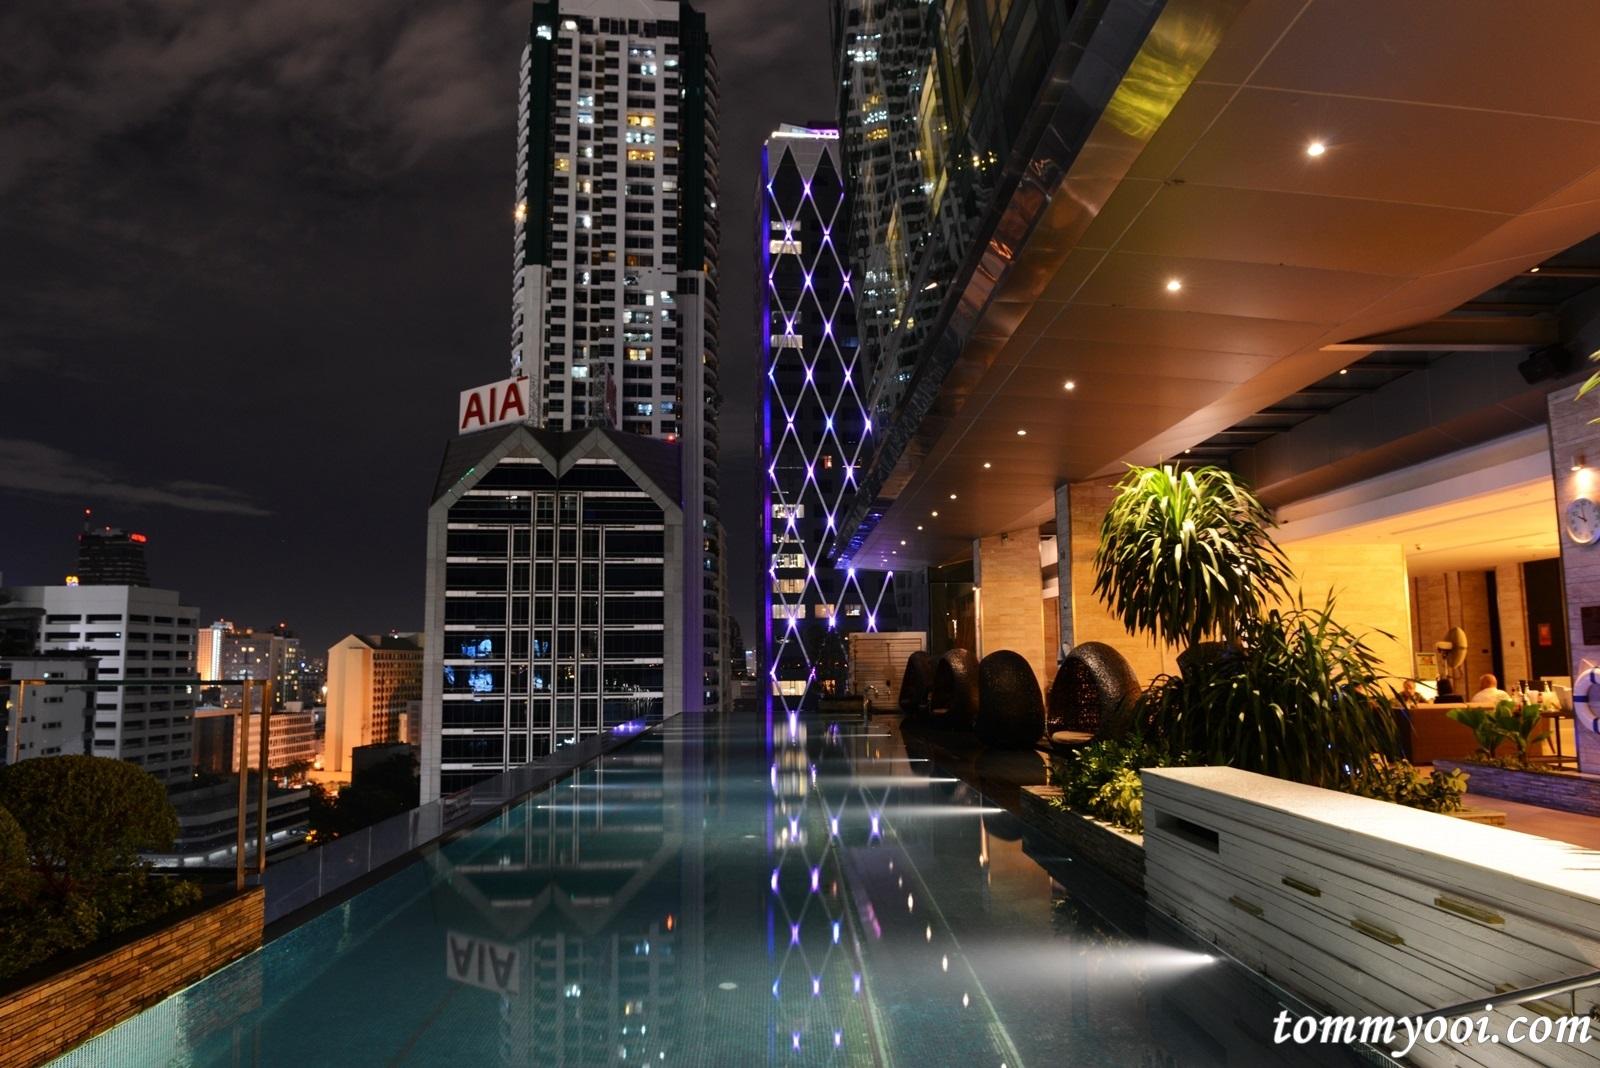 Eastin grand hotel sathorn bangkok tommy ooi travel guide for Grand hotel